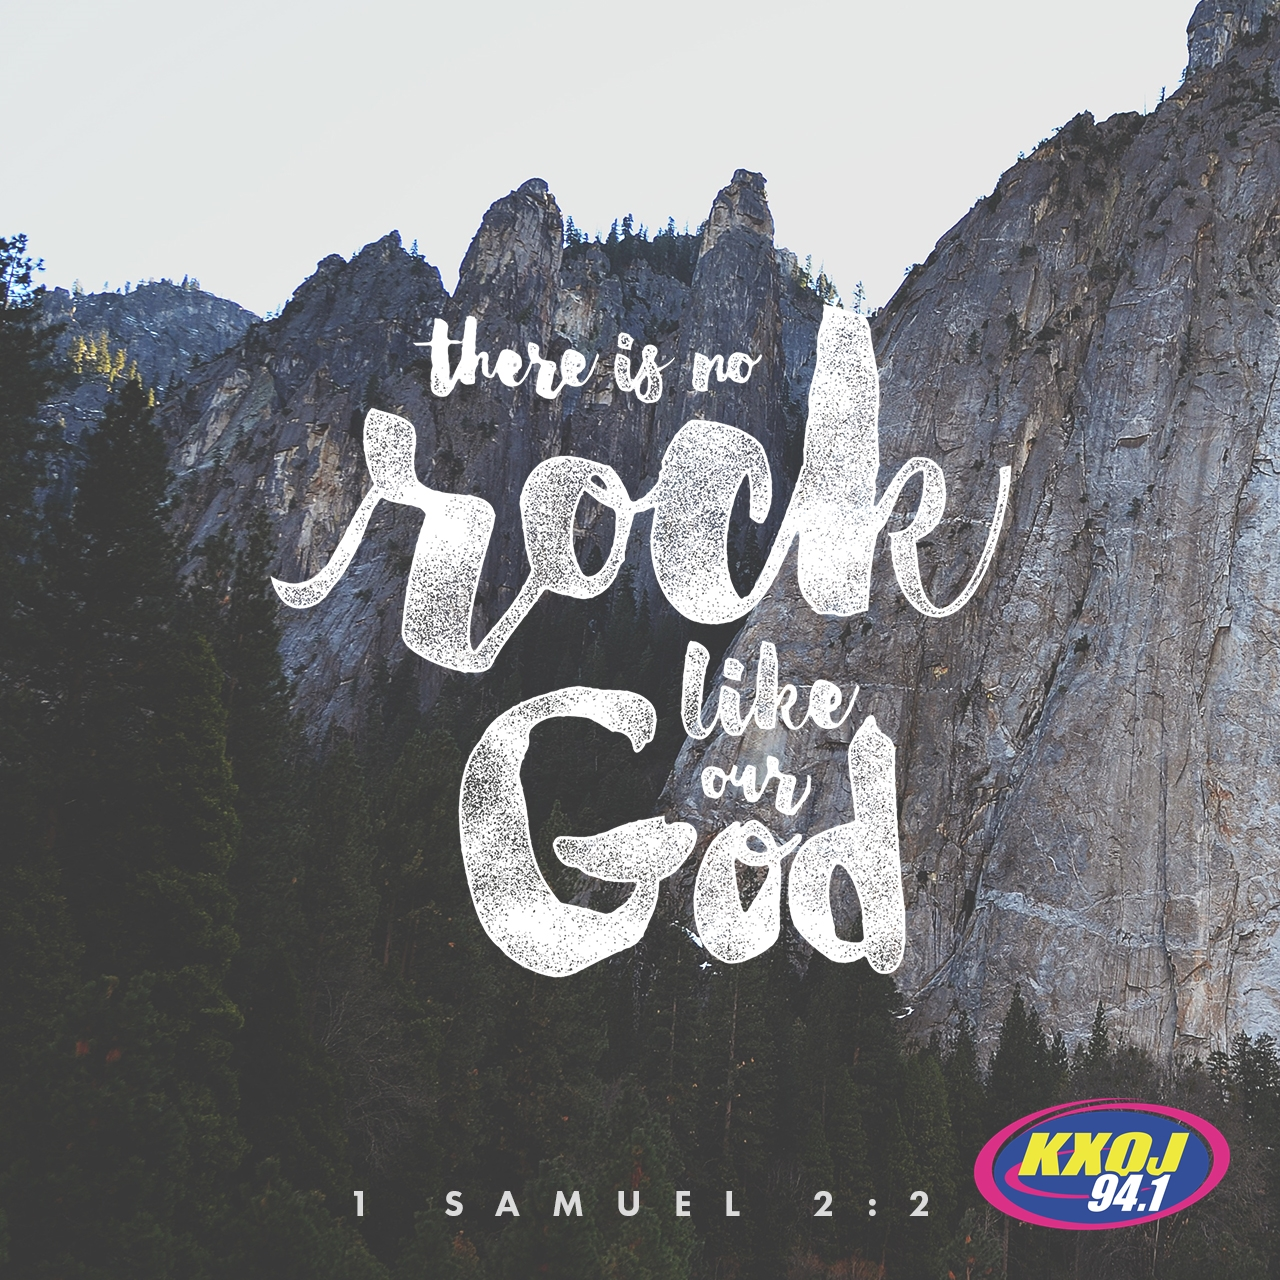 May 28th - 1 Samuel 2:2